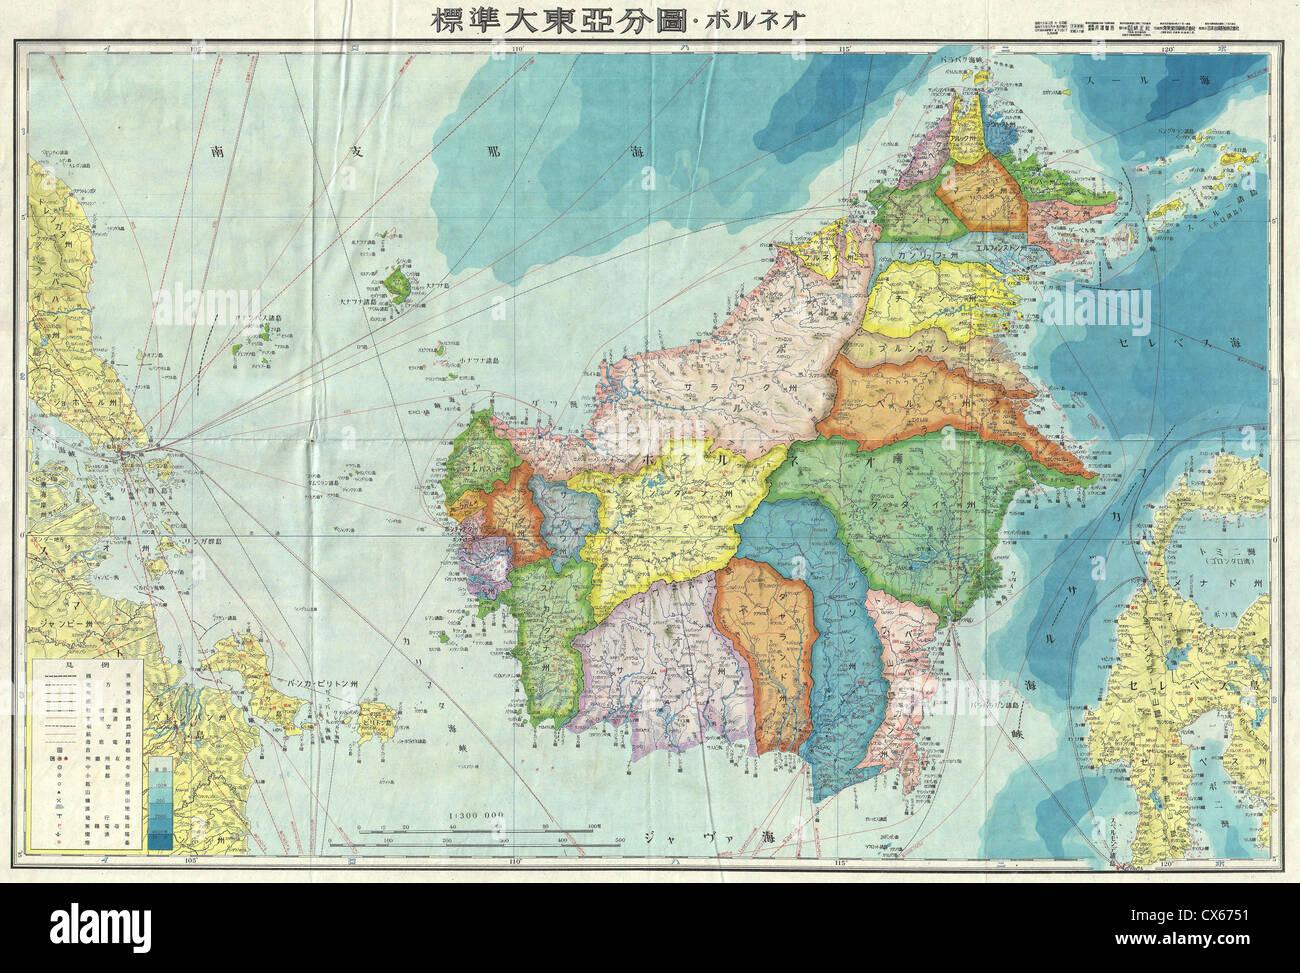 1943 World War II Japanese Aeronautical Map of Borneo - Stock Image